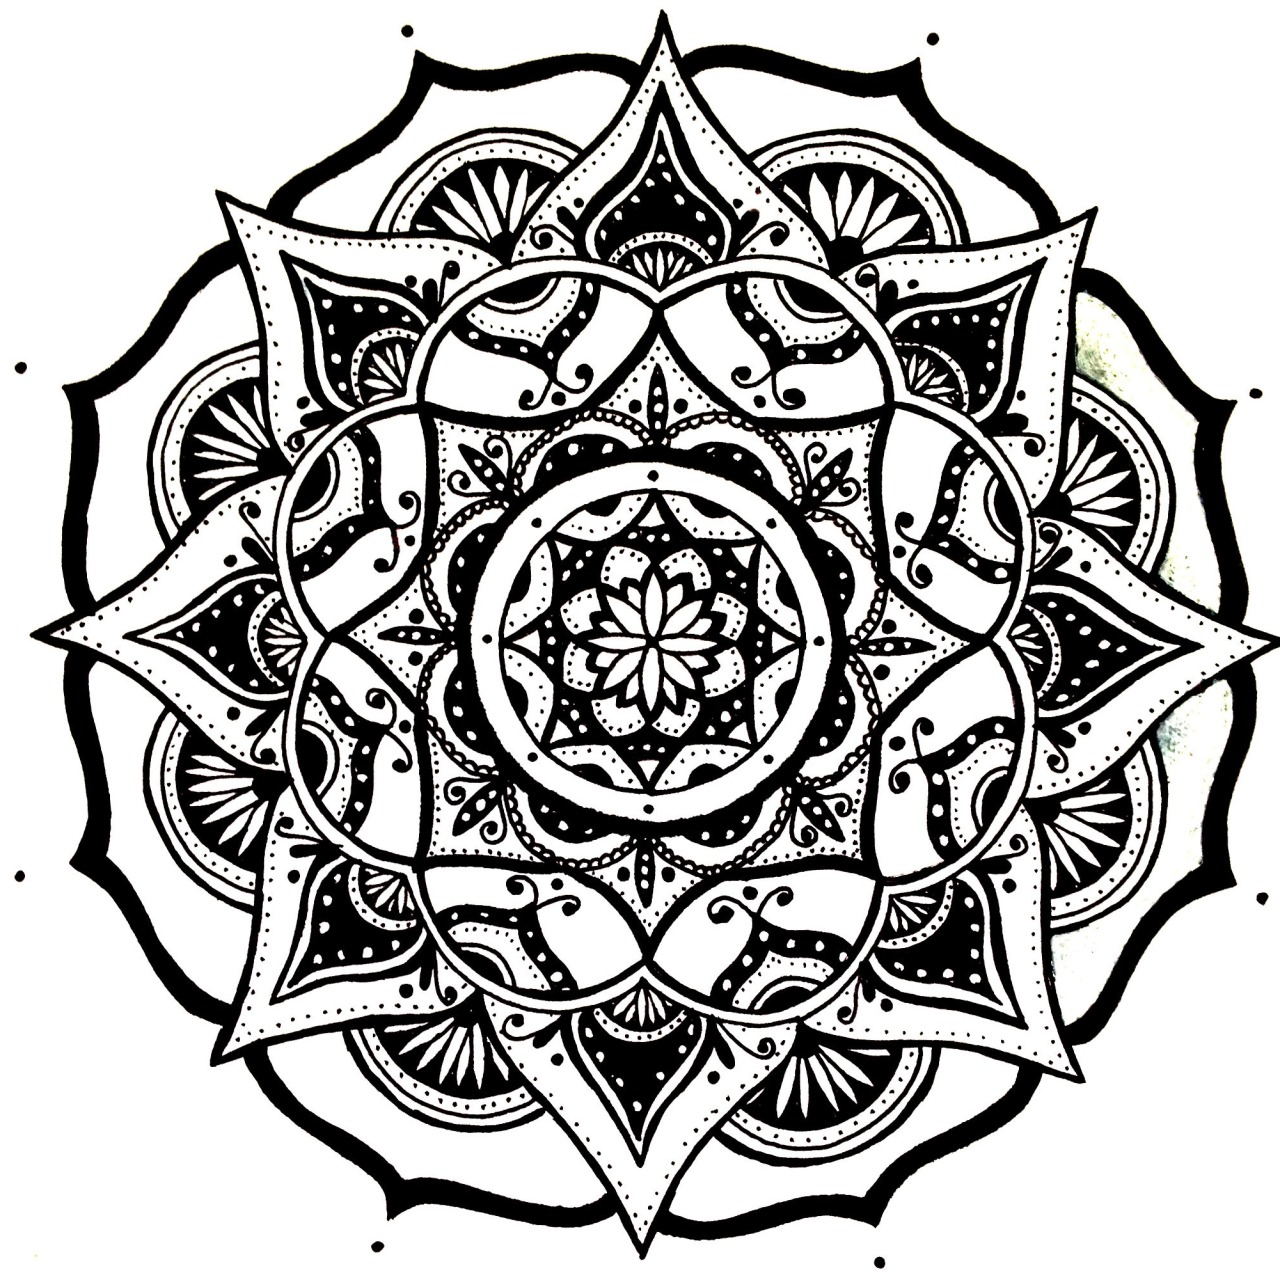 1280x1280 Mandalas Sketch Simple